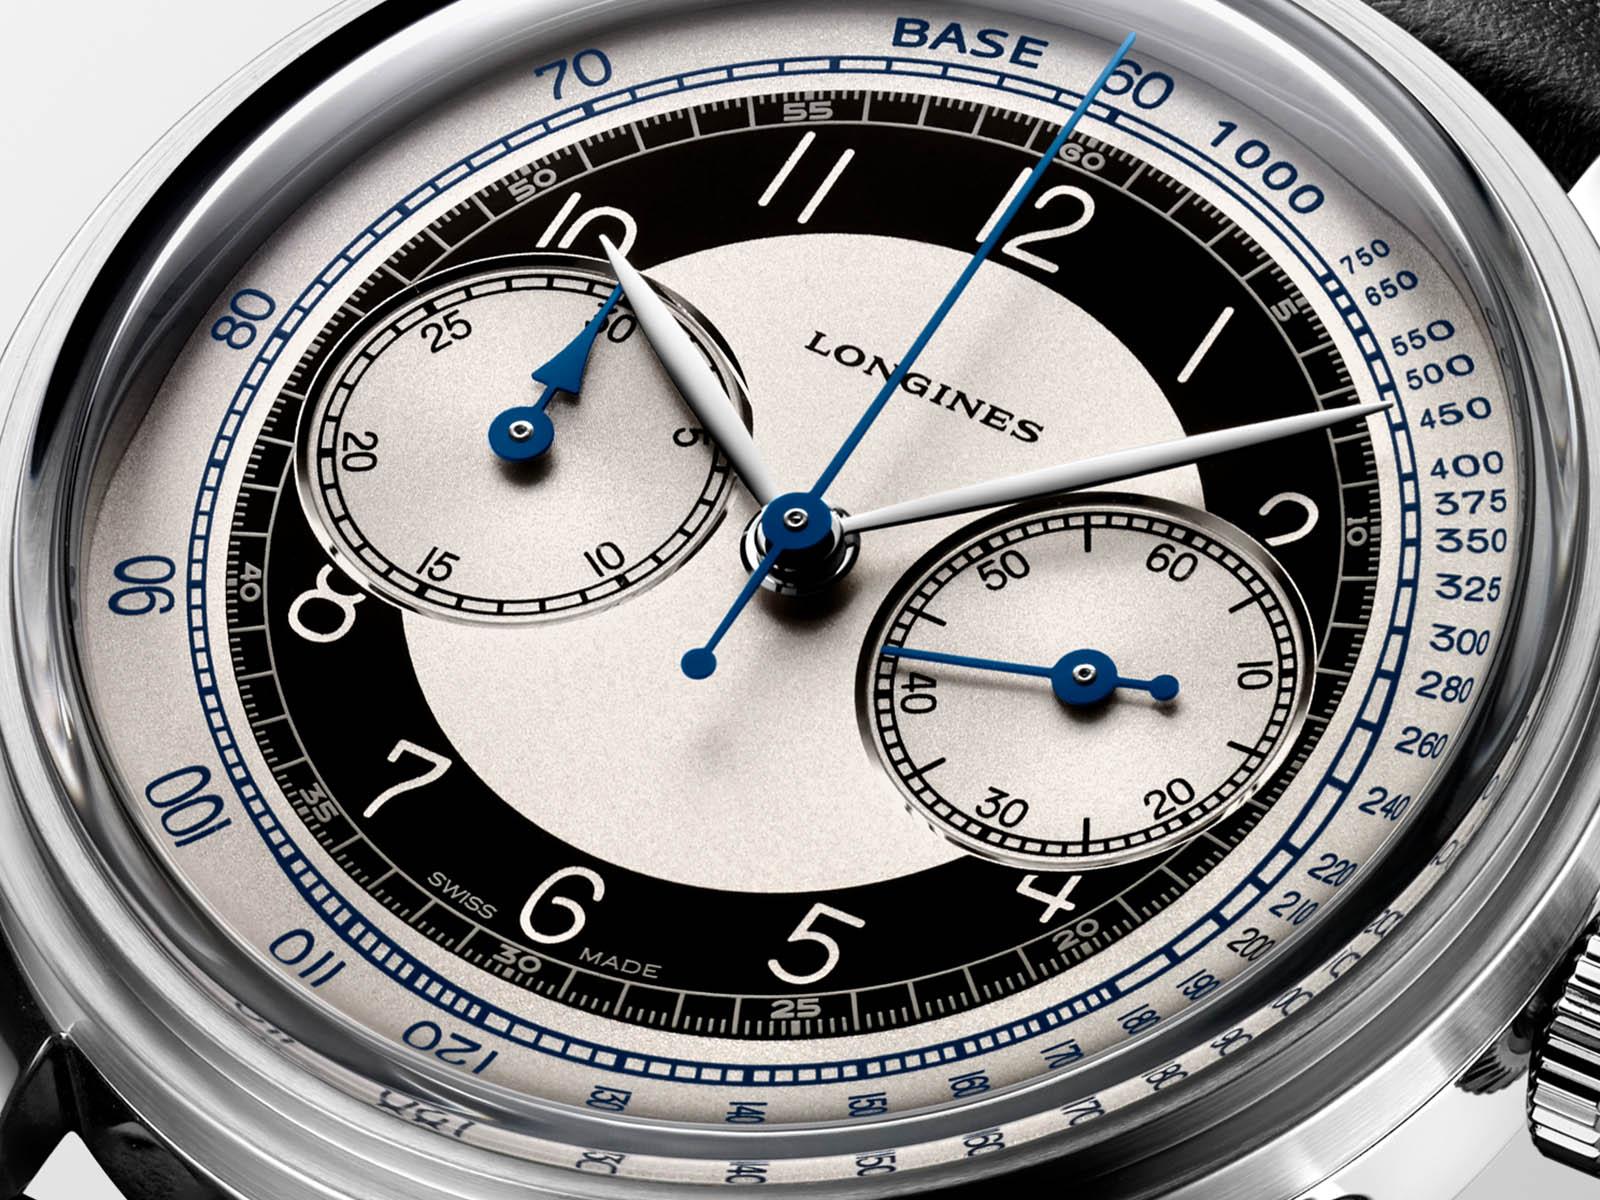 l2-830-4-93-0-longines-heritage-classic-chronograph-4.jpg